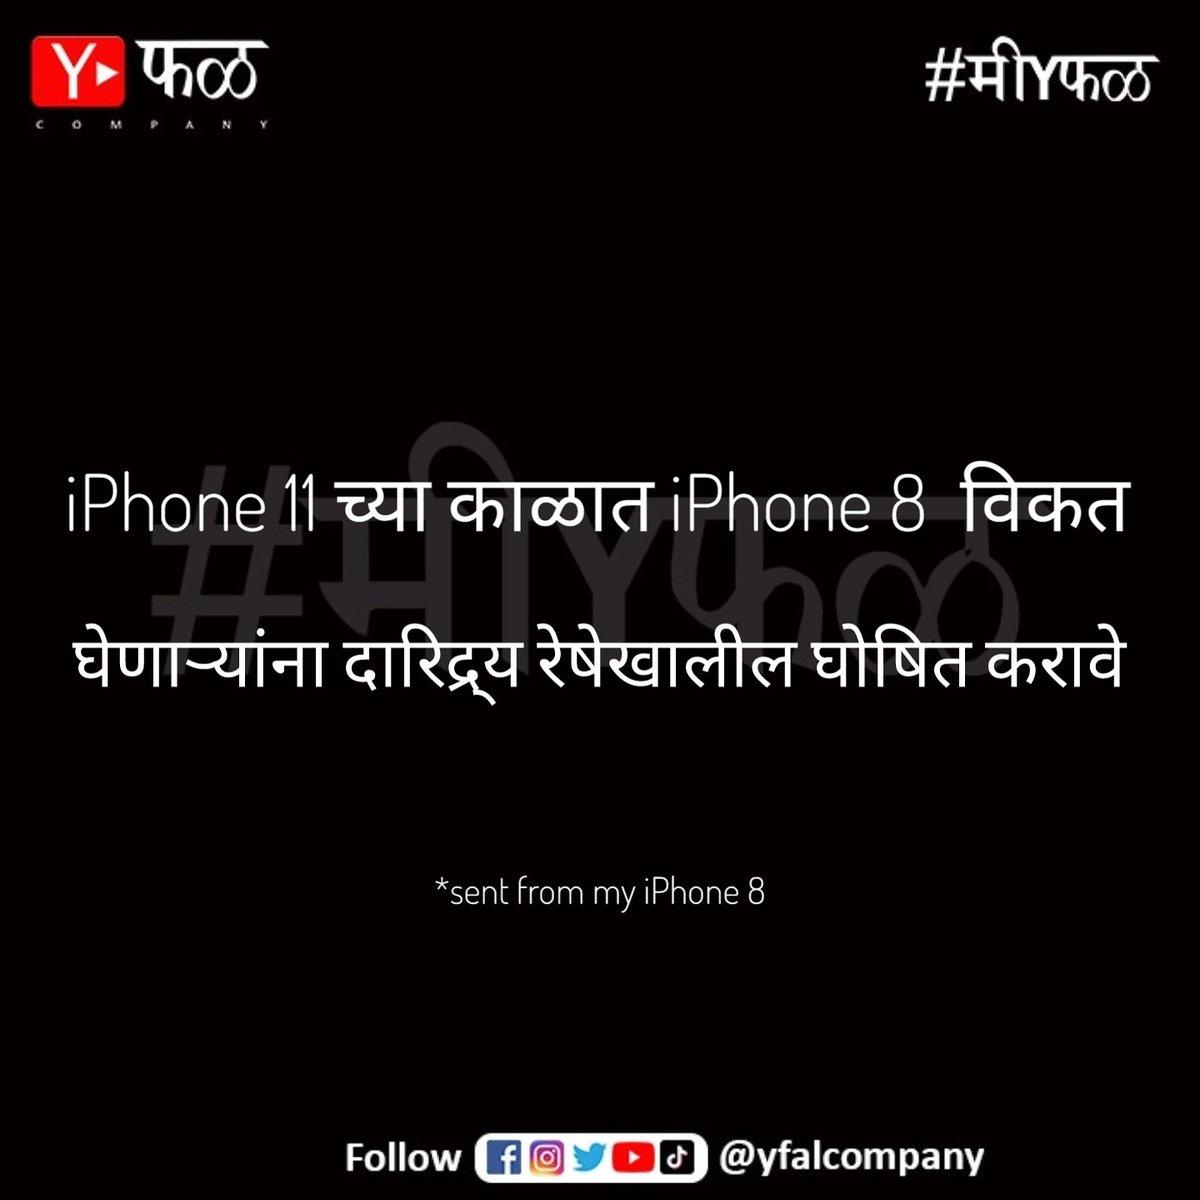 मला पण आई फोन पाहिजे #मीYफळ #atmanirbharbharat  #atmanirbhar #MarathiMemes #yfalcompany #MarathiMemes #marathi #marathimotivational #marathitroll  #marathijokes  #marathicomedy #iphonese #siri #apple #iphonelovers #sundayvibes #COVIDー19 #coronavirus #StayHome #staysafe #pic.twitter.com/BMj2O2xiWW